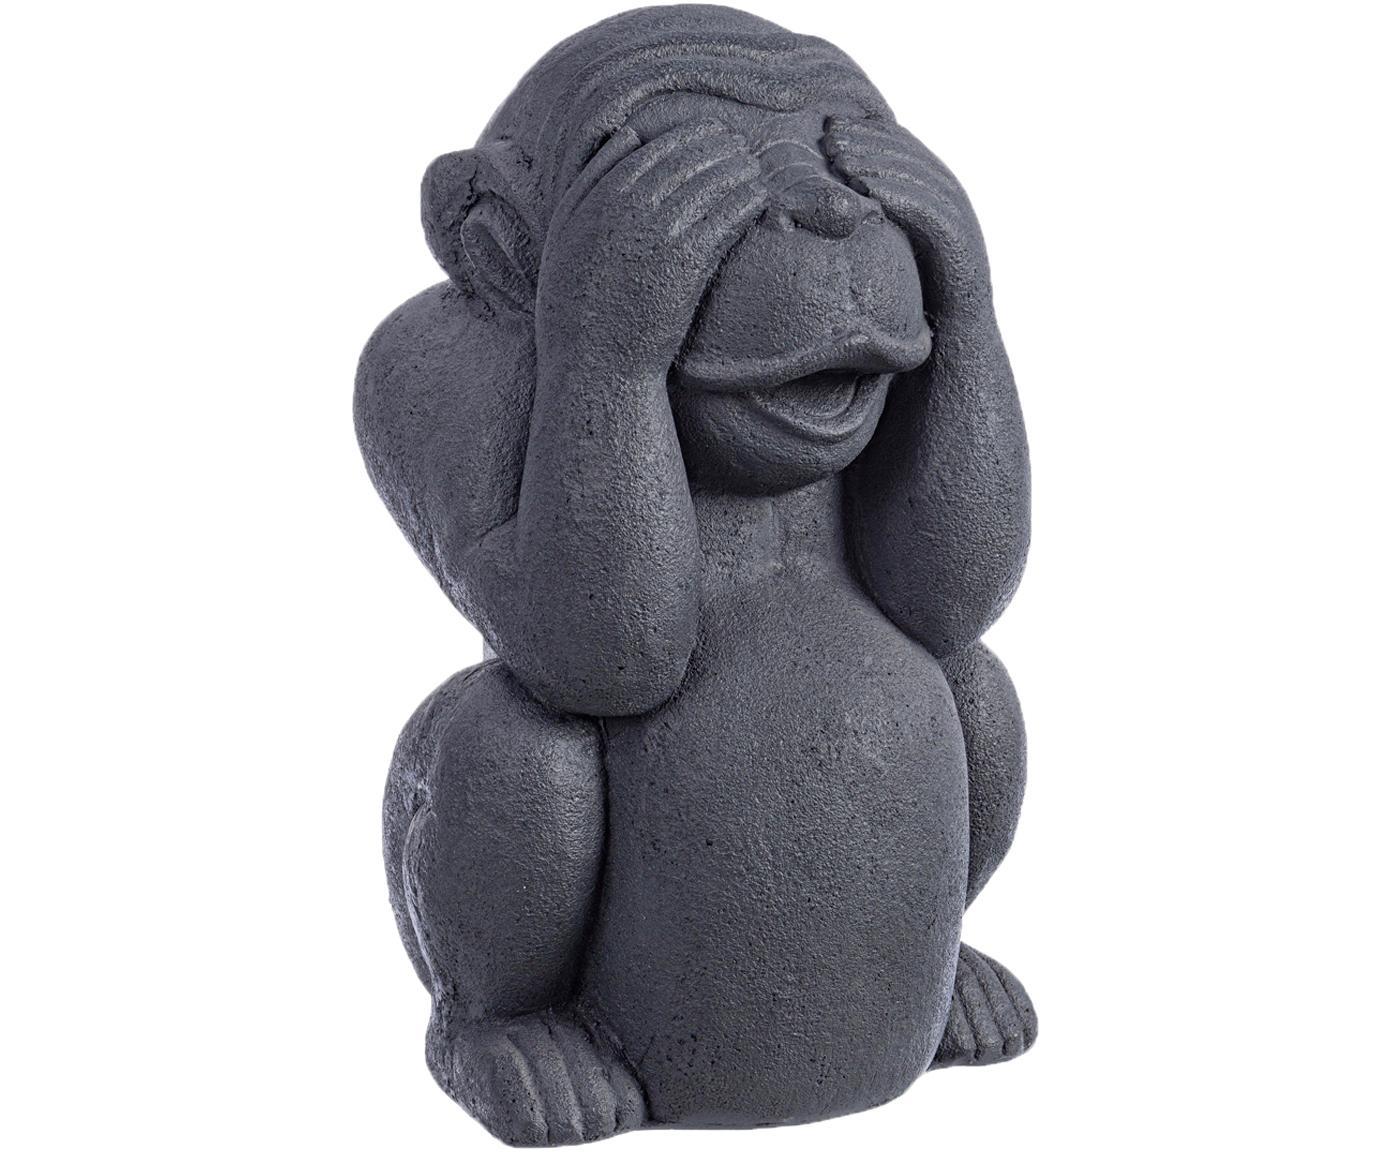 Figura decorativa Monkey, Hormigón recubierto, Gris antracita, An 22 x Al 36 cm